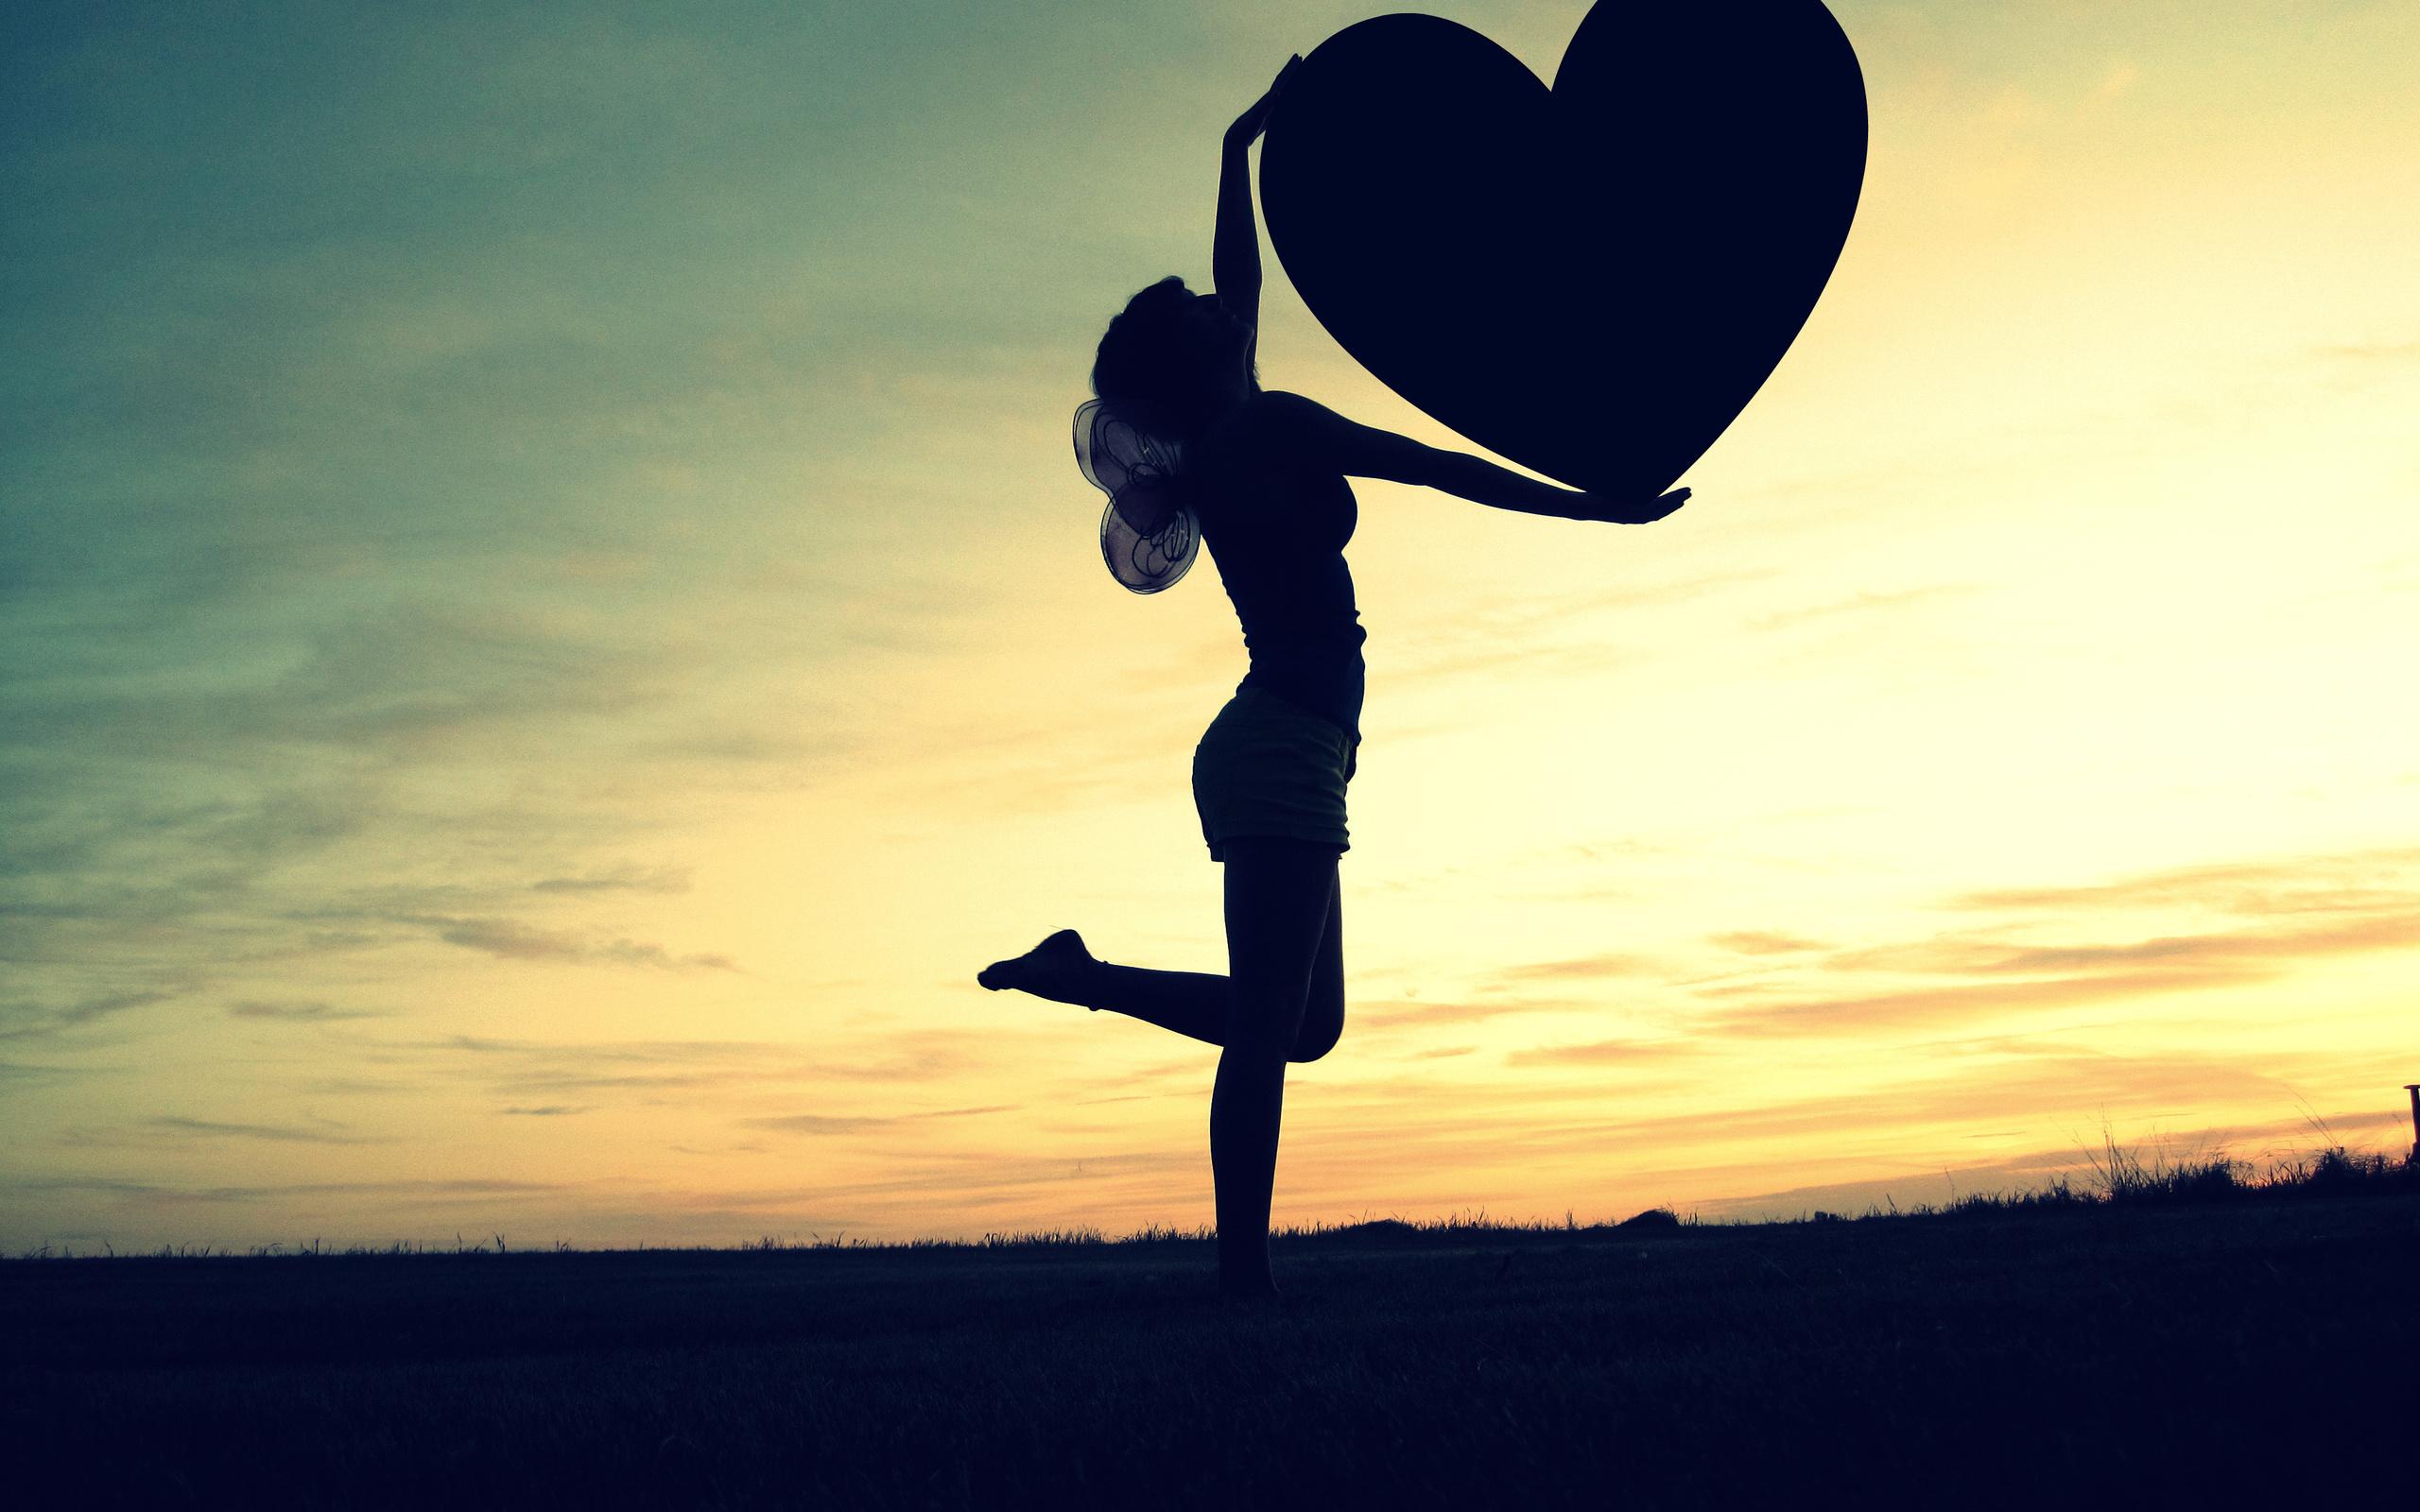 قلوب بالصور (2)